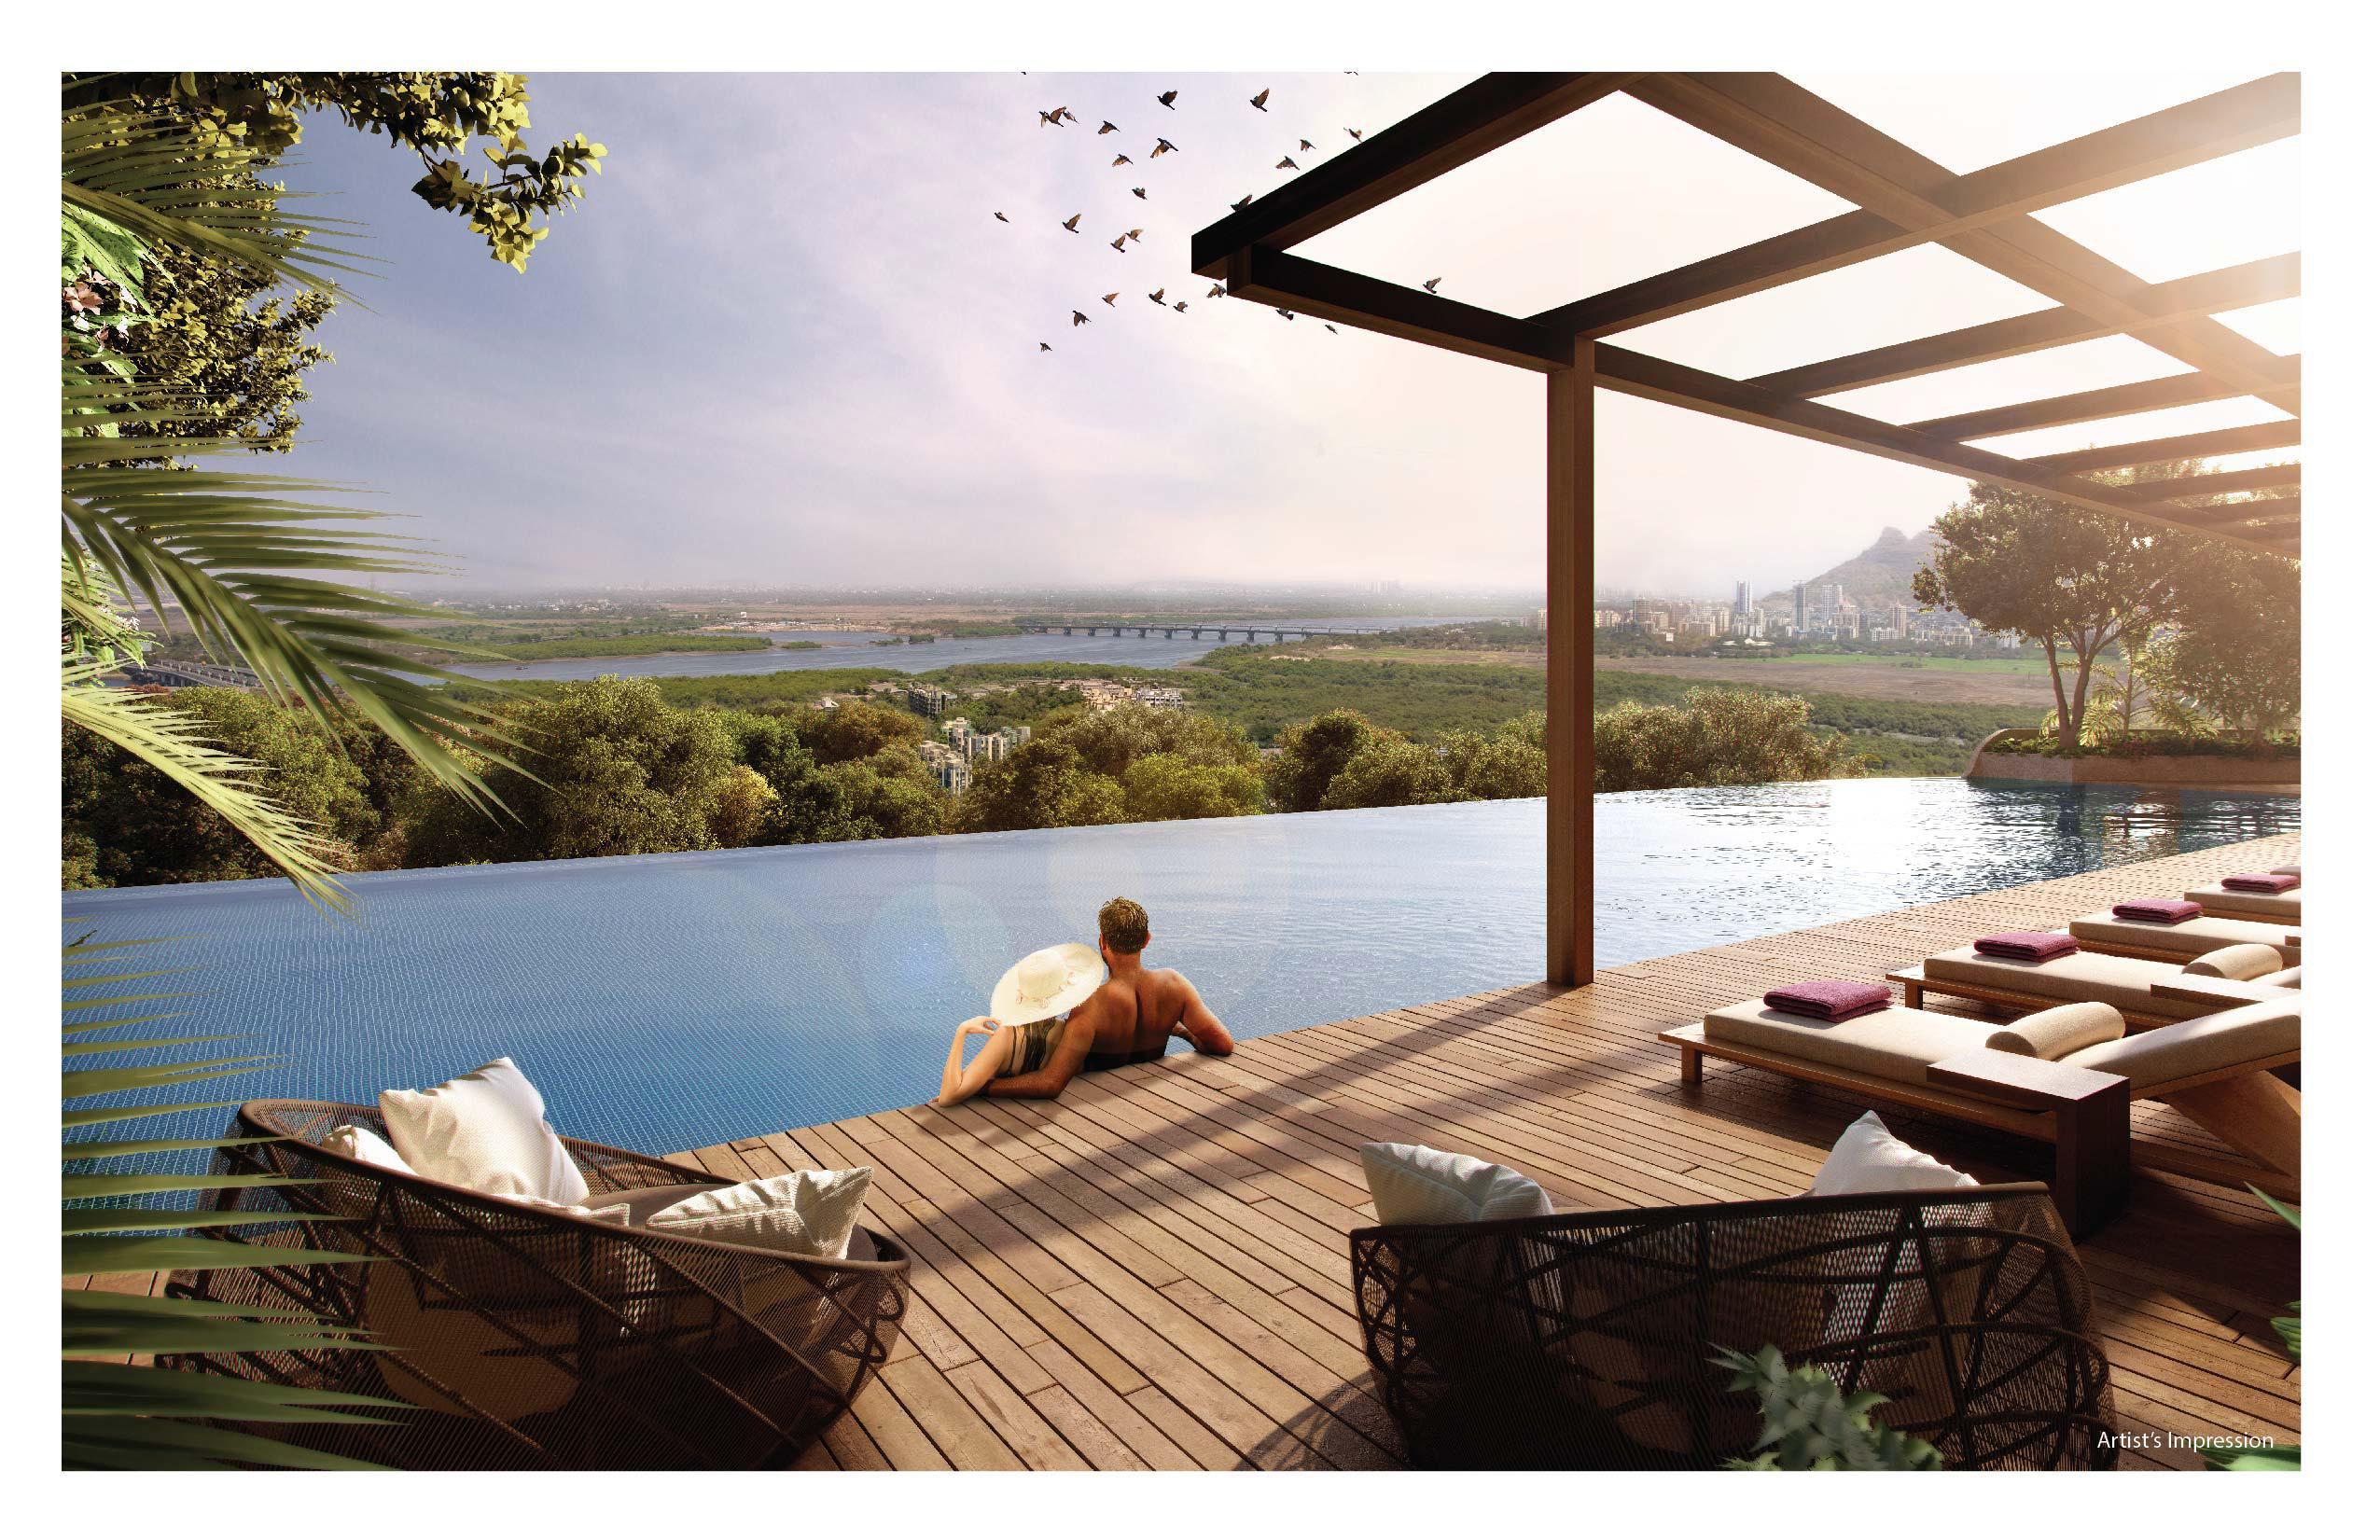 piramal vaikunth vidit amenities features7